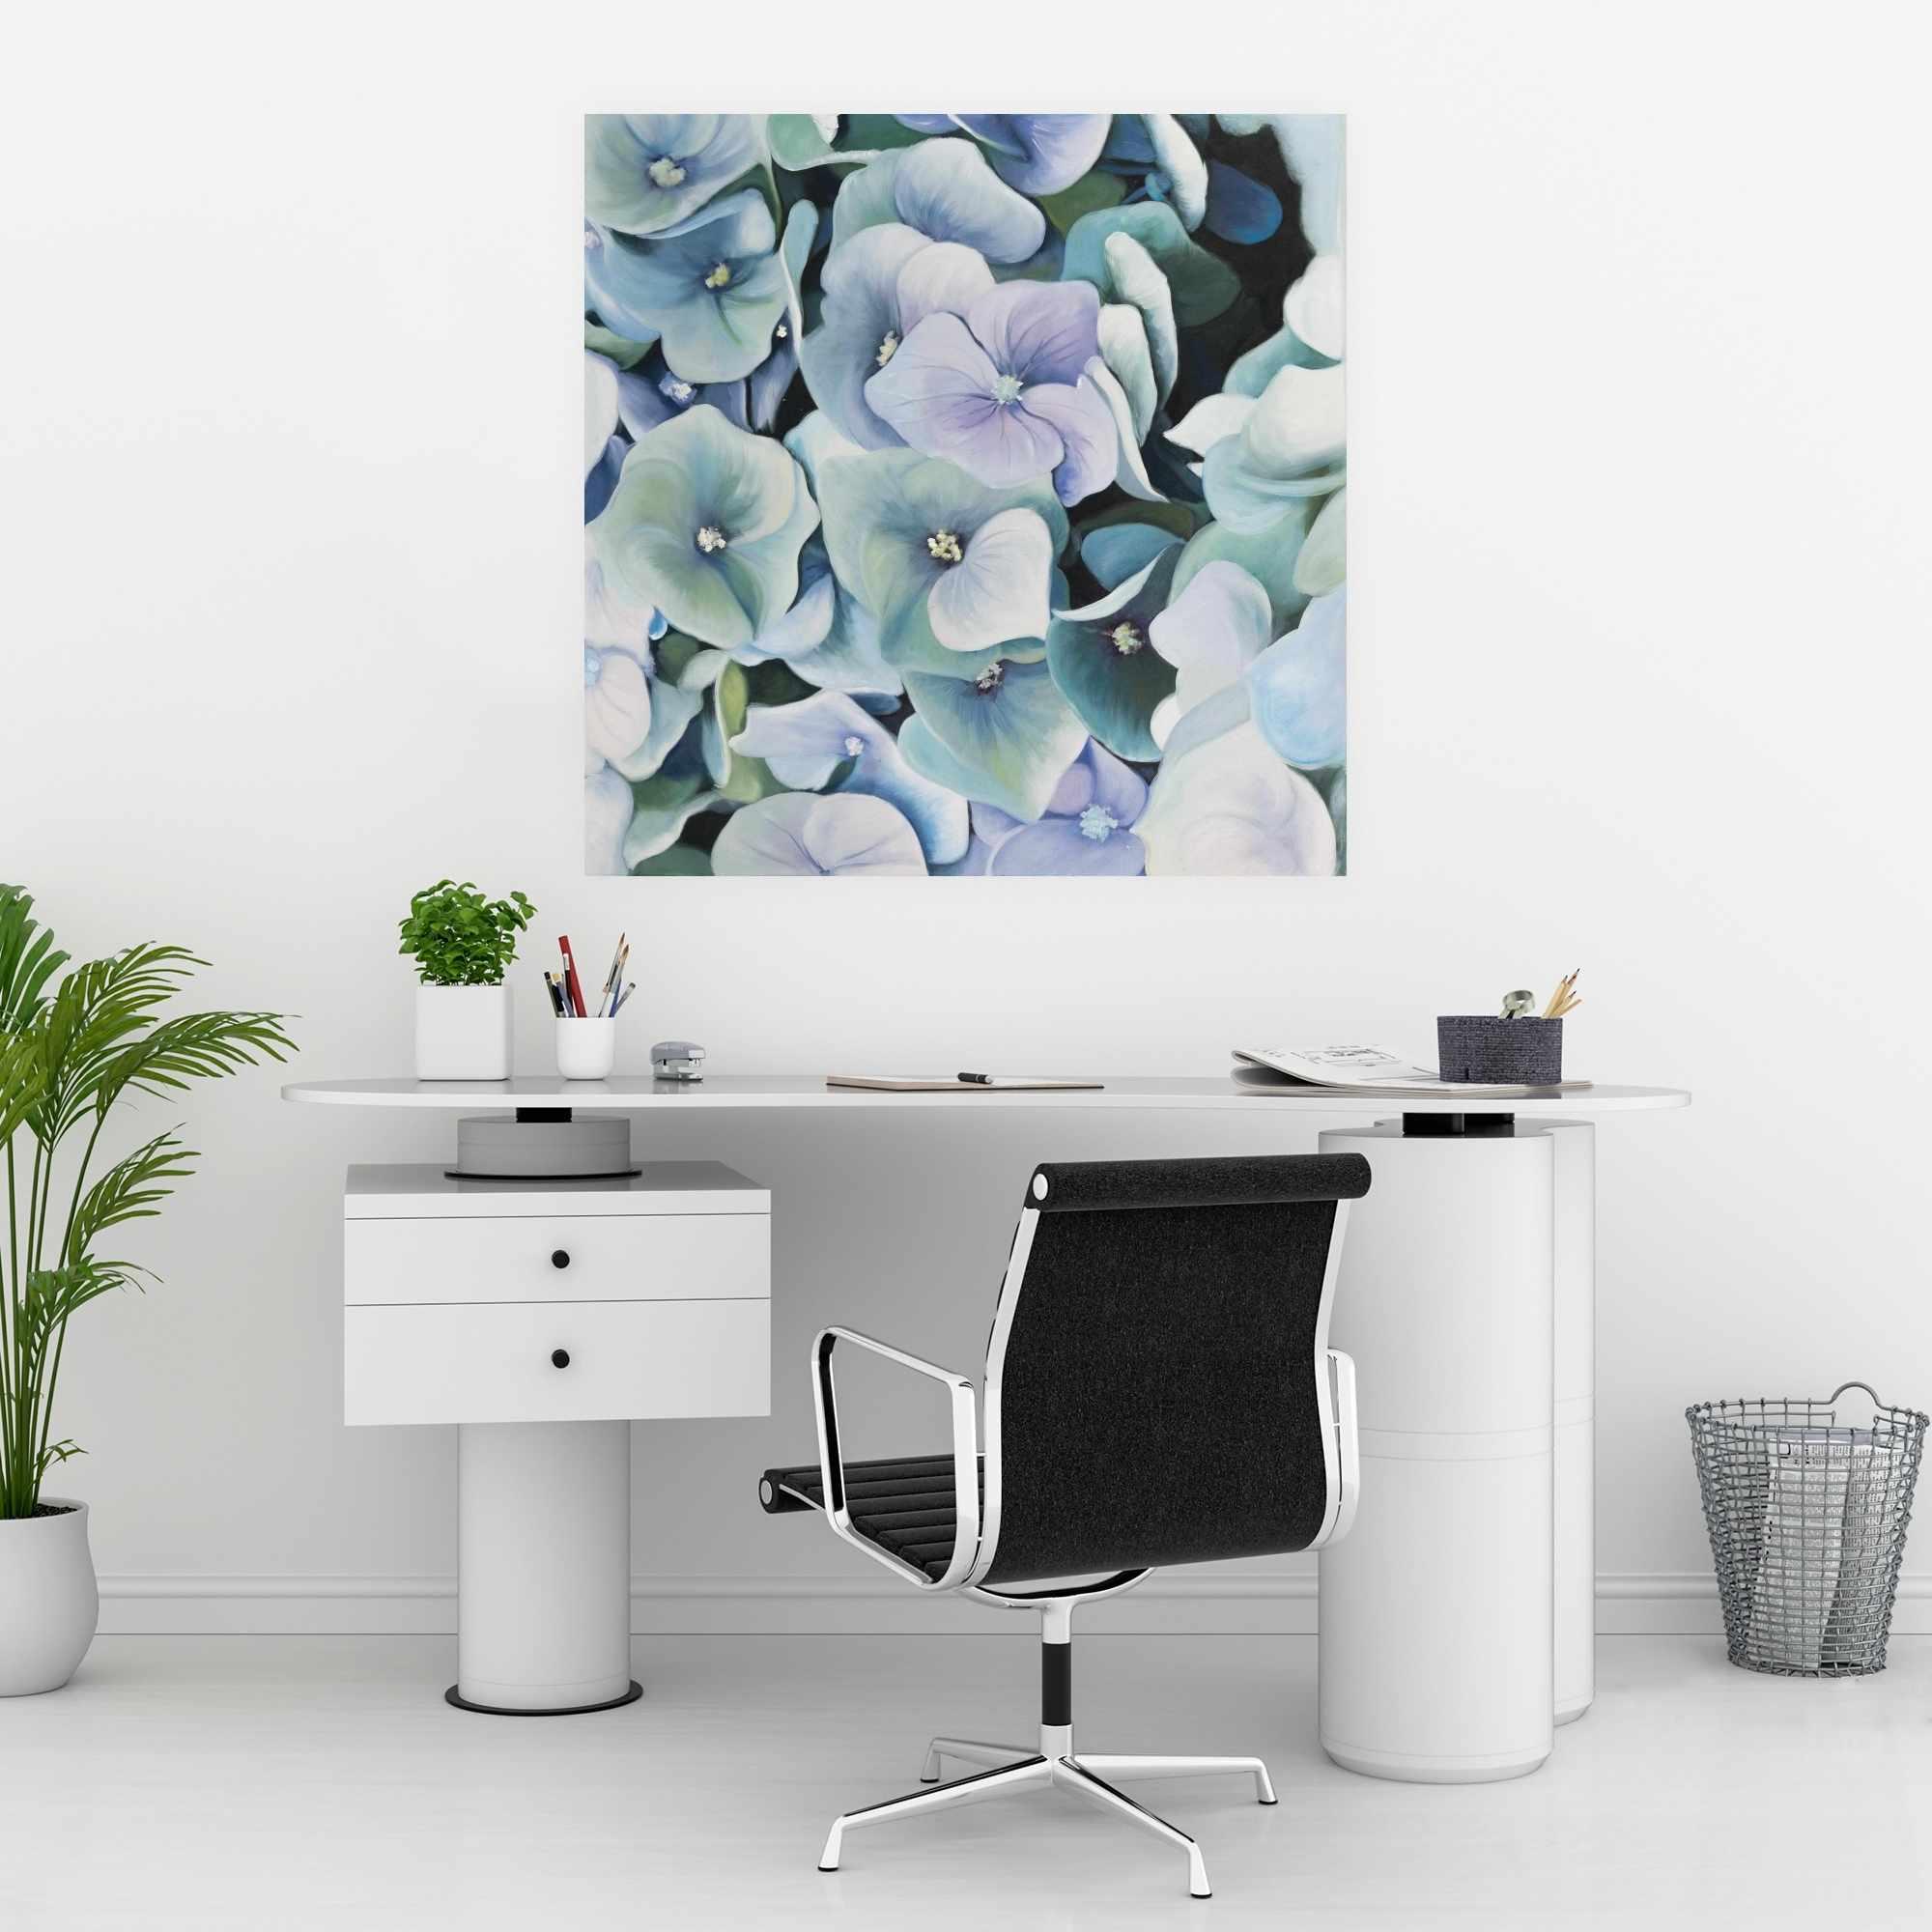 Poster 30 x 30 - Hydrangea plant